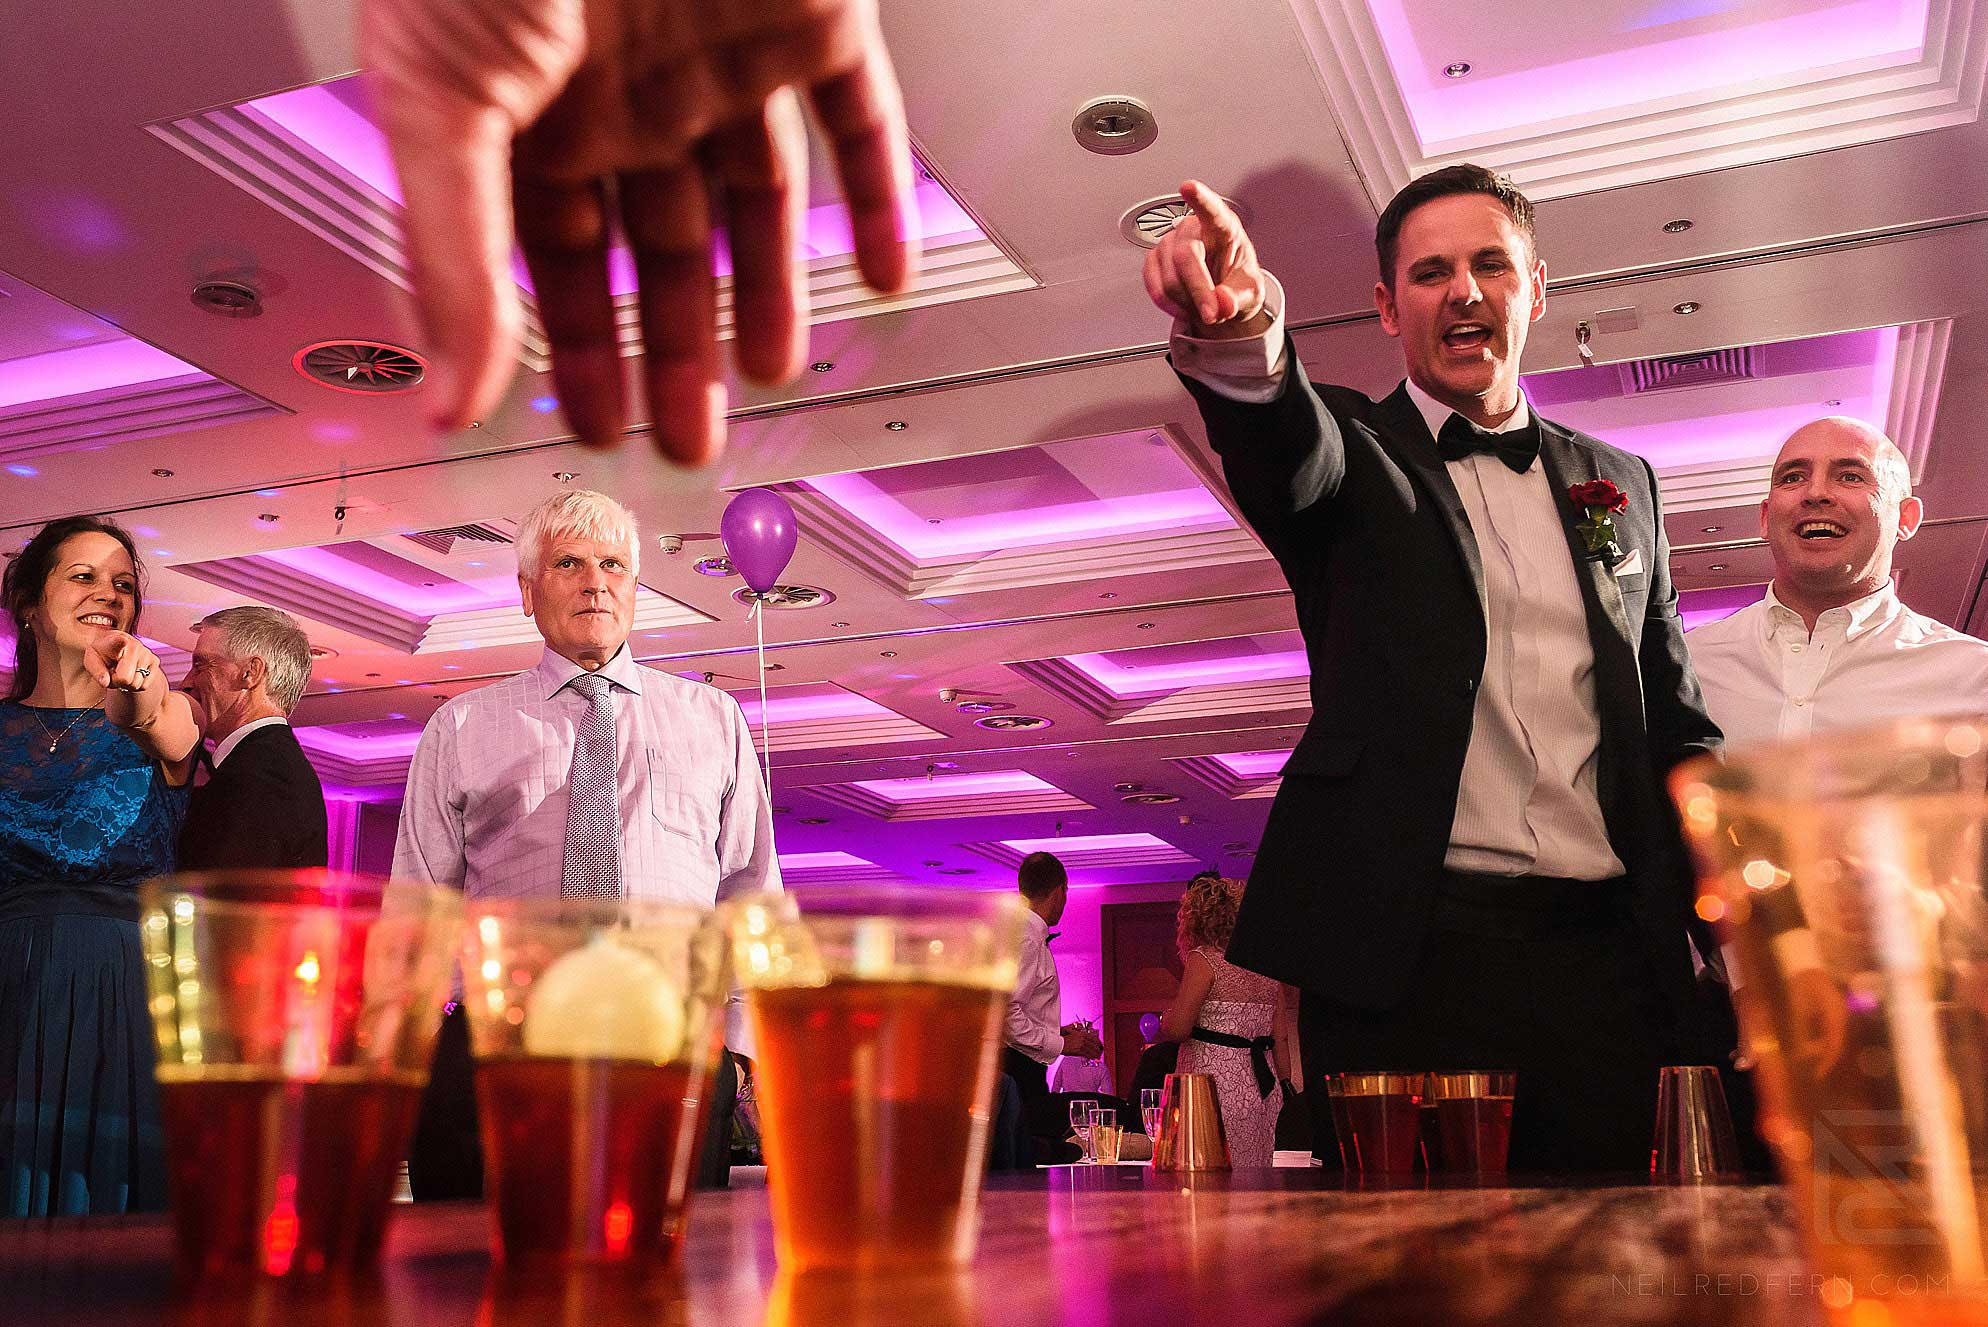 guests playing beer pong at wedding